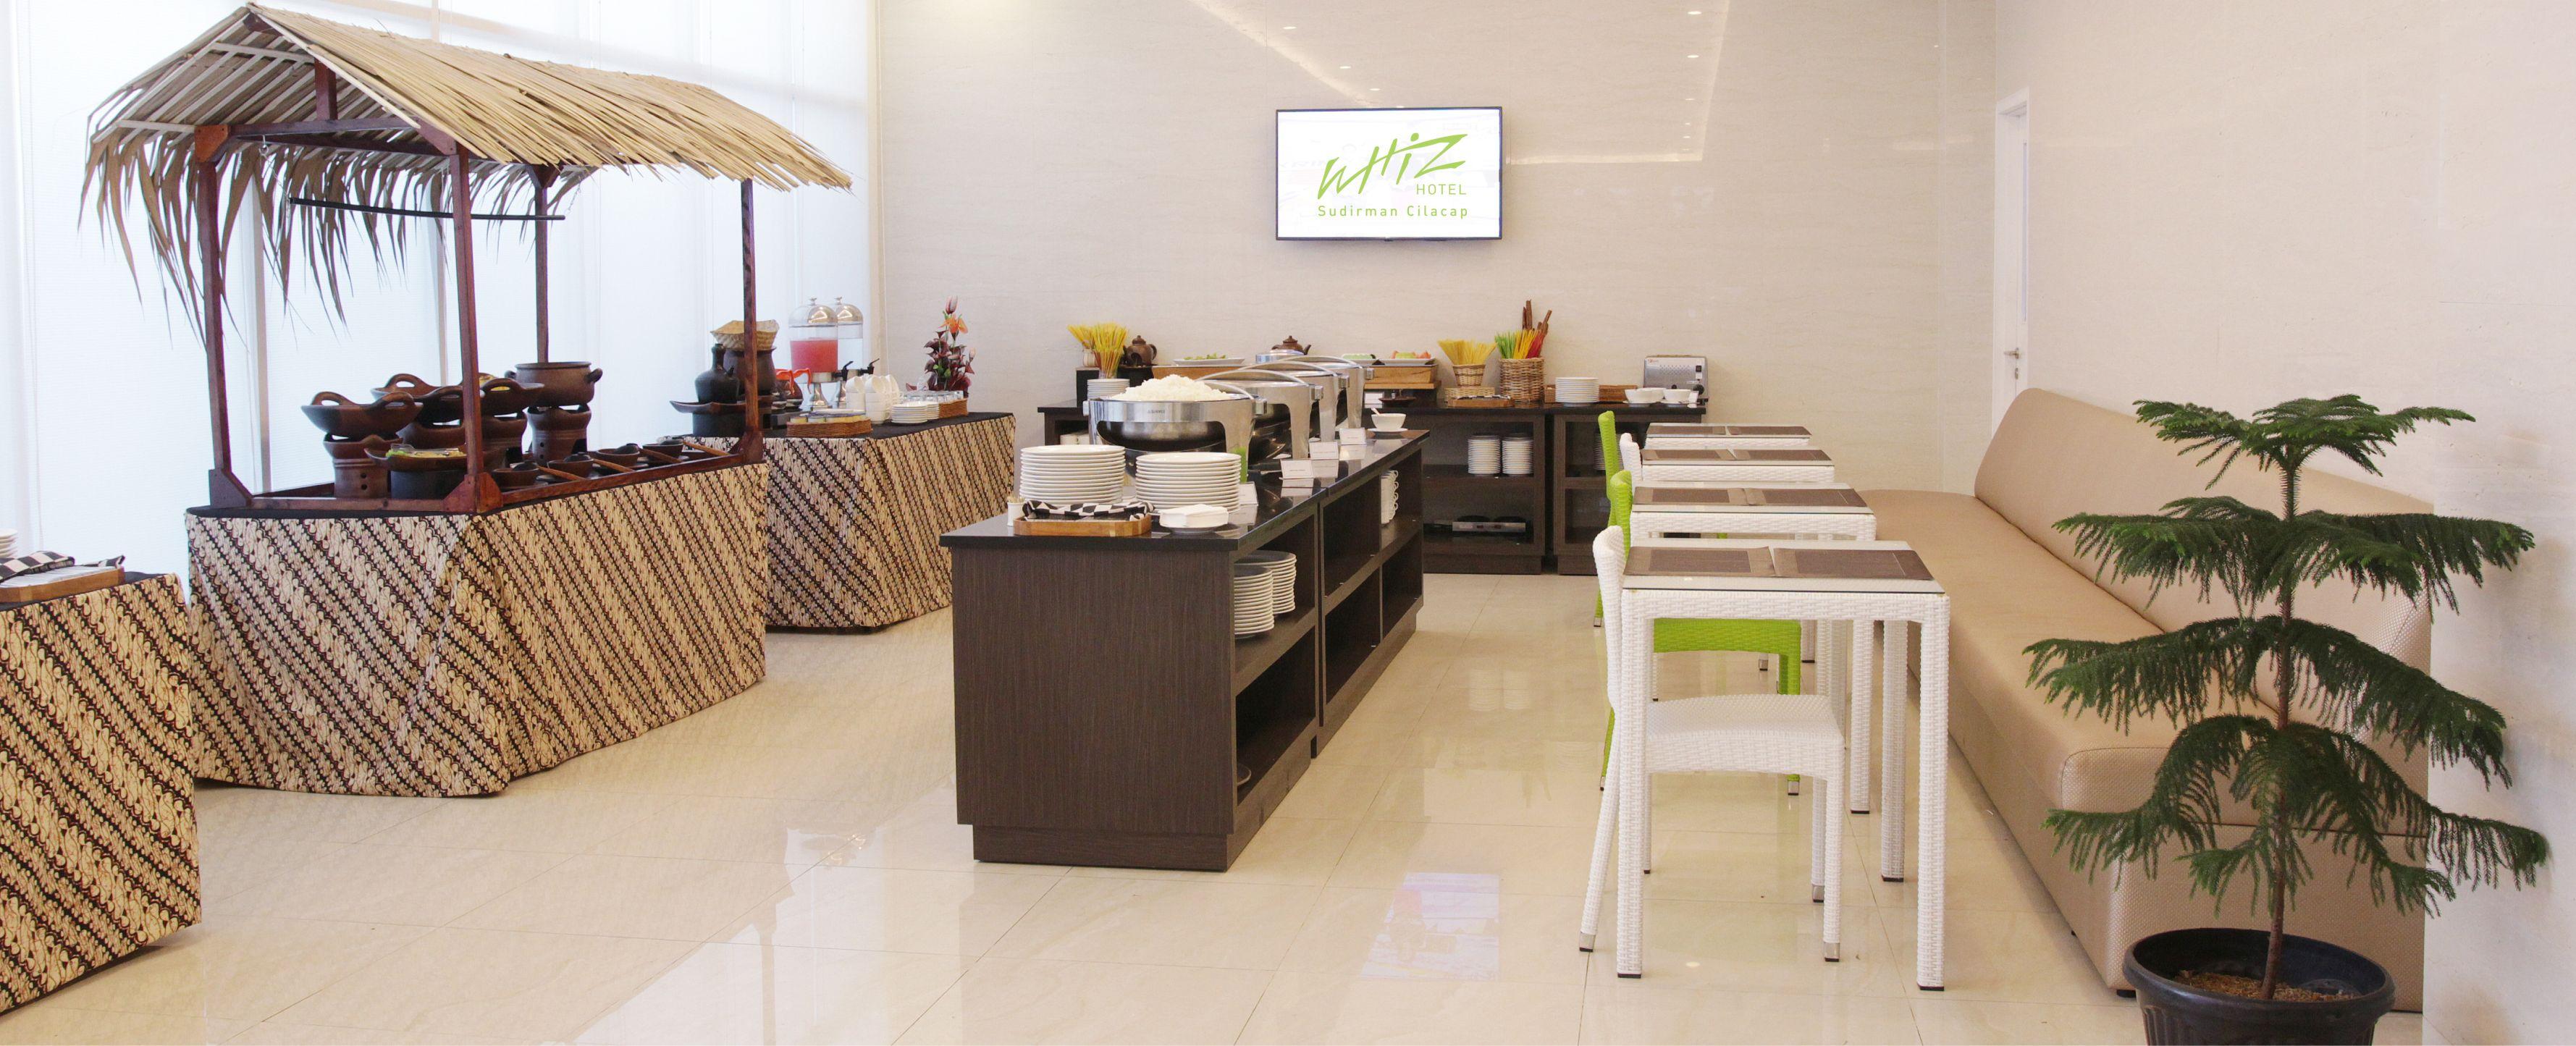 Whiz Hotel Sudirman Cilacap By Intiwhiz International Kukies Kelapa Agung Mirah Bali Previous Next